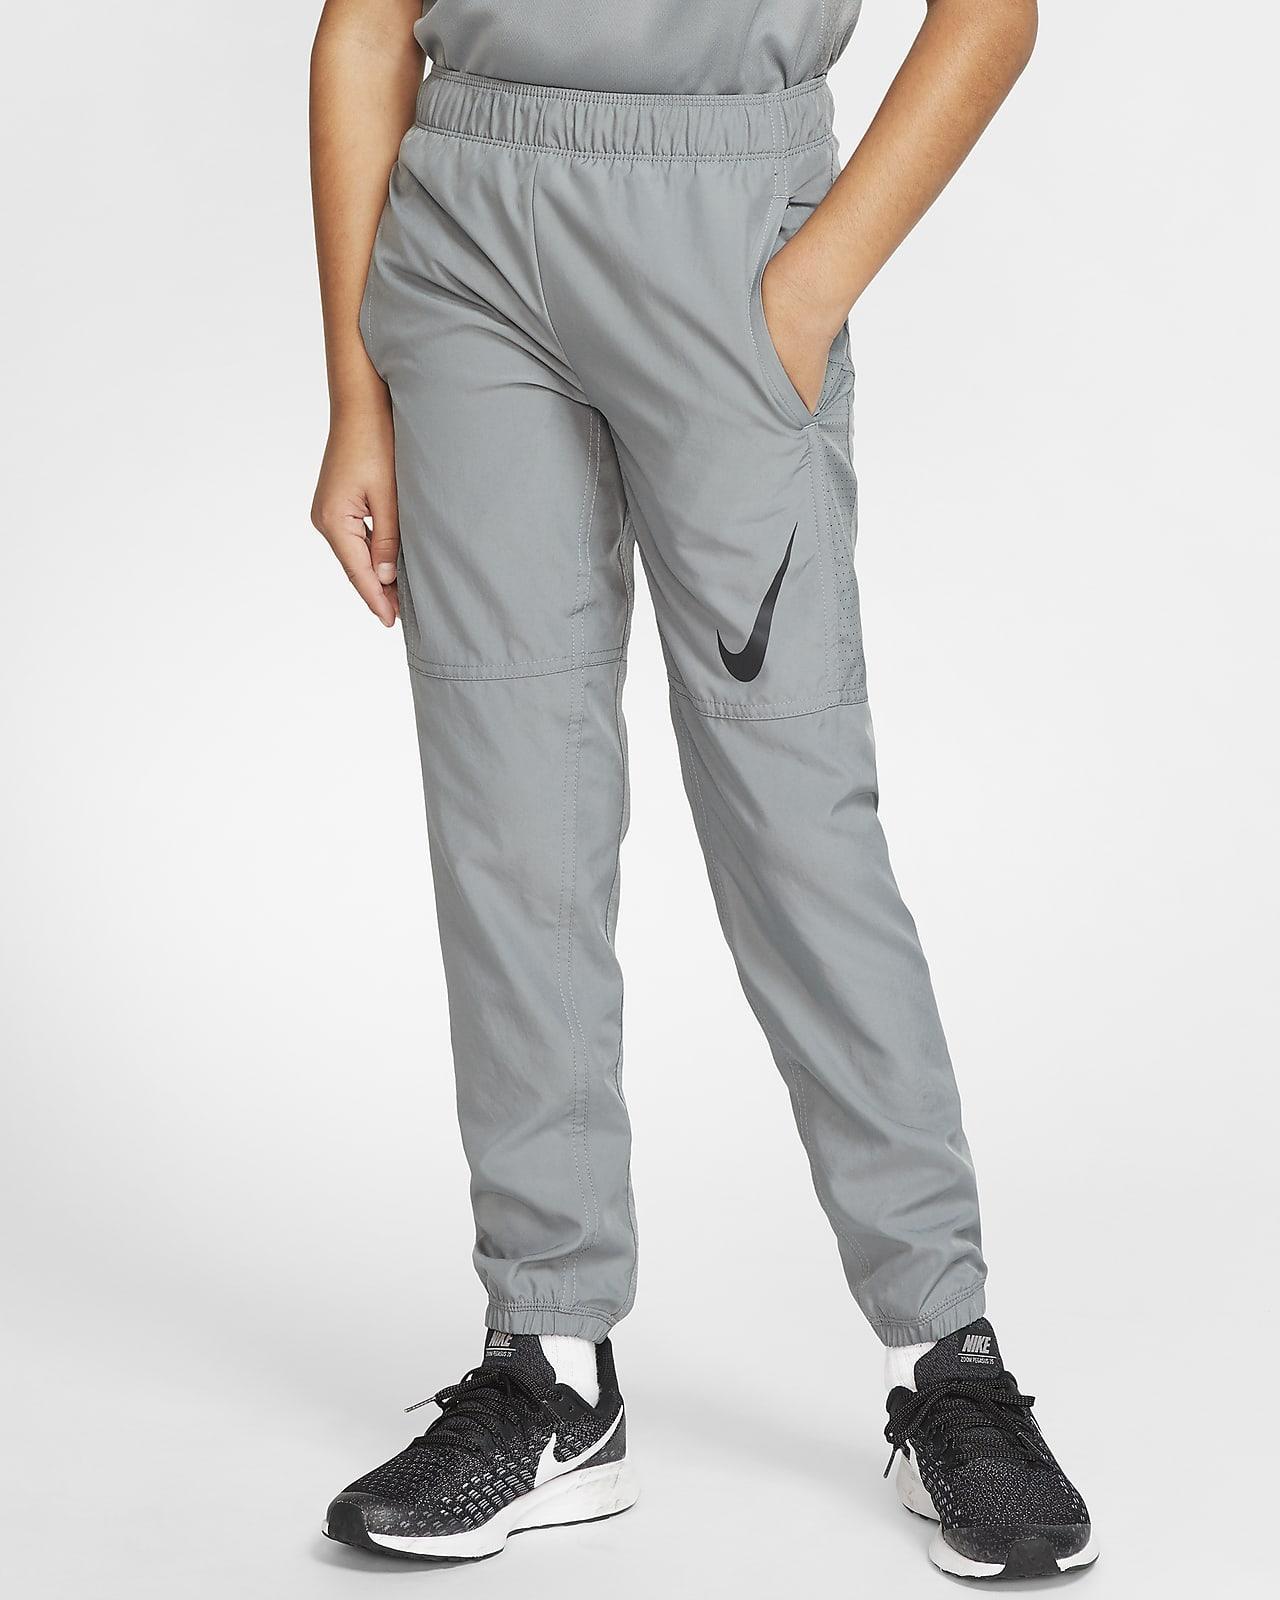 Rafflesia Arnoldi modo pellizco  Nike Big Kids' (Boys') Training Pants. Nike.com